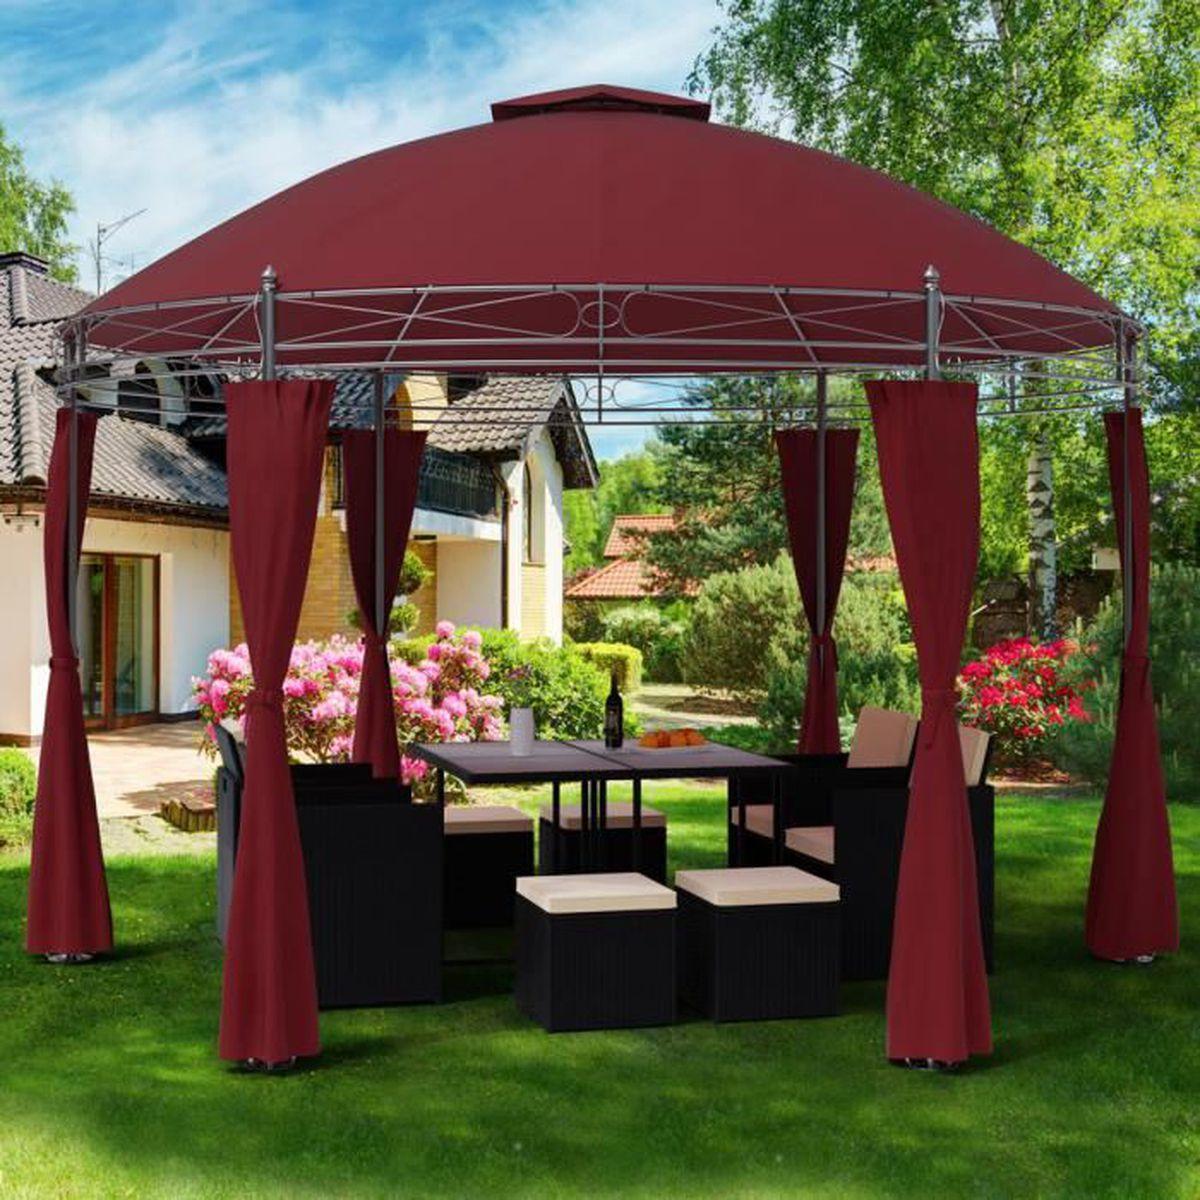 Tonnelle Kiosque De Jardin tonnelle toscana - 3,5 m - pavillon - tente de jardin - barnum rond jardin  extérieur